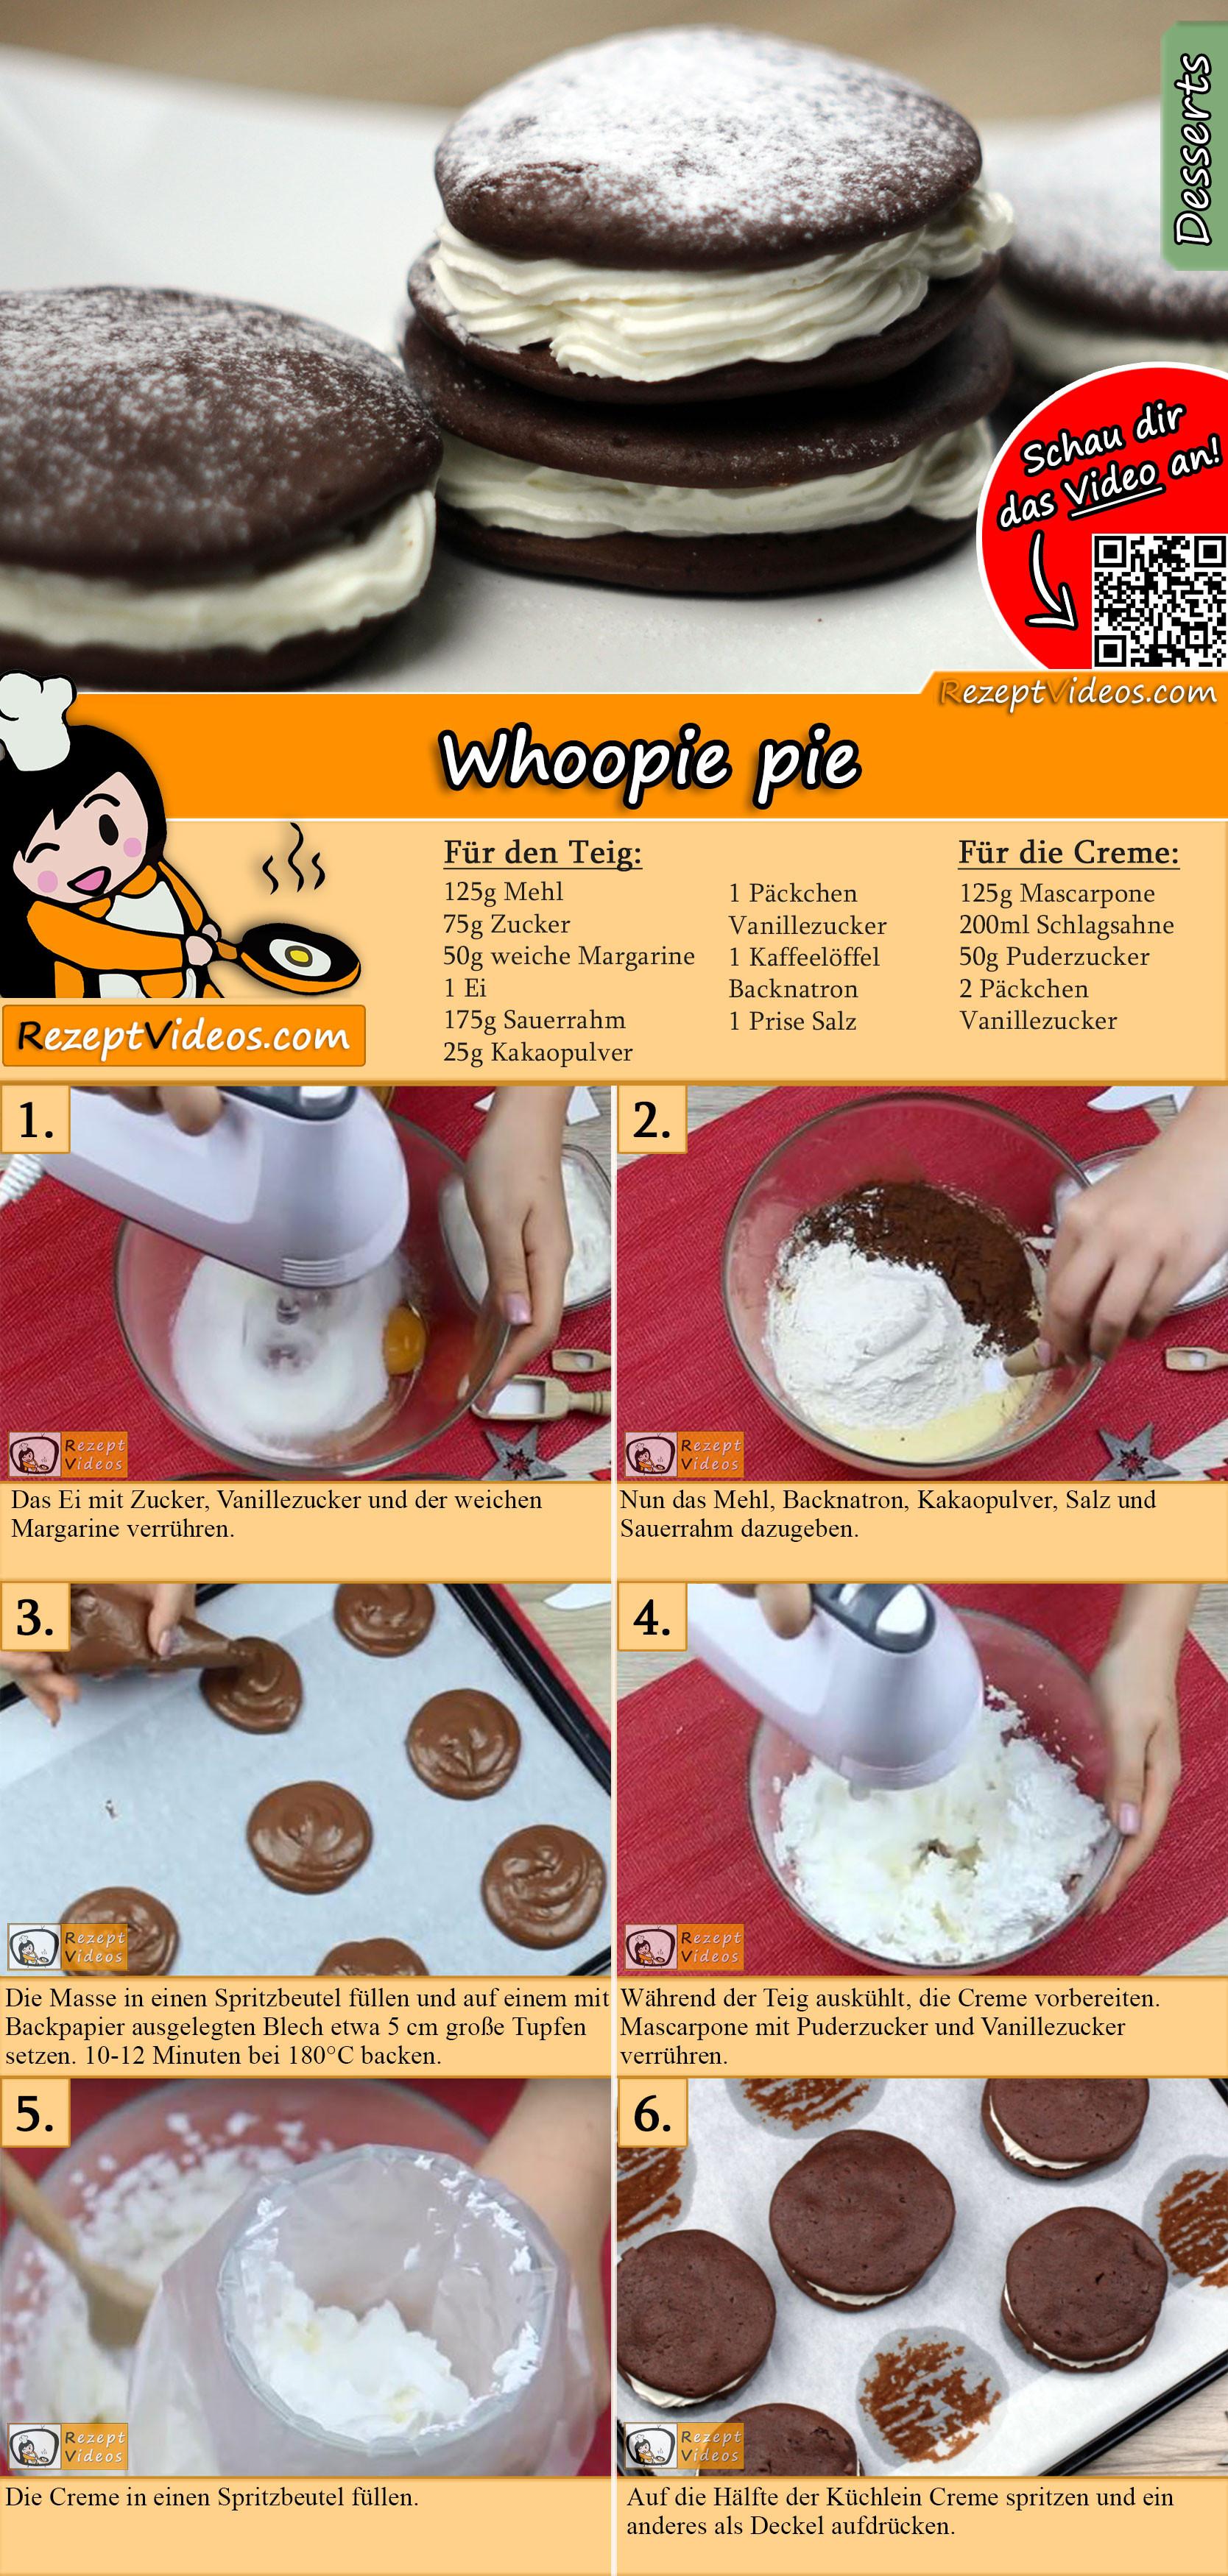 Whoopie Pie Rezept mit Video